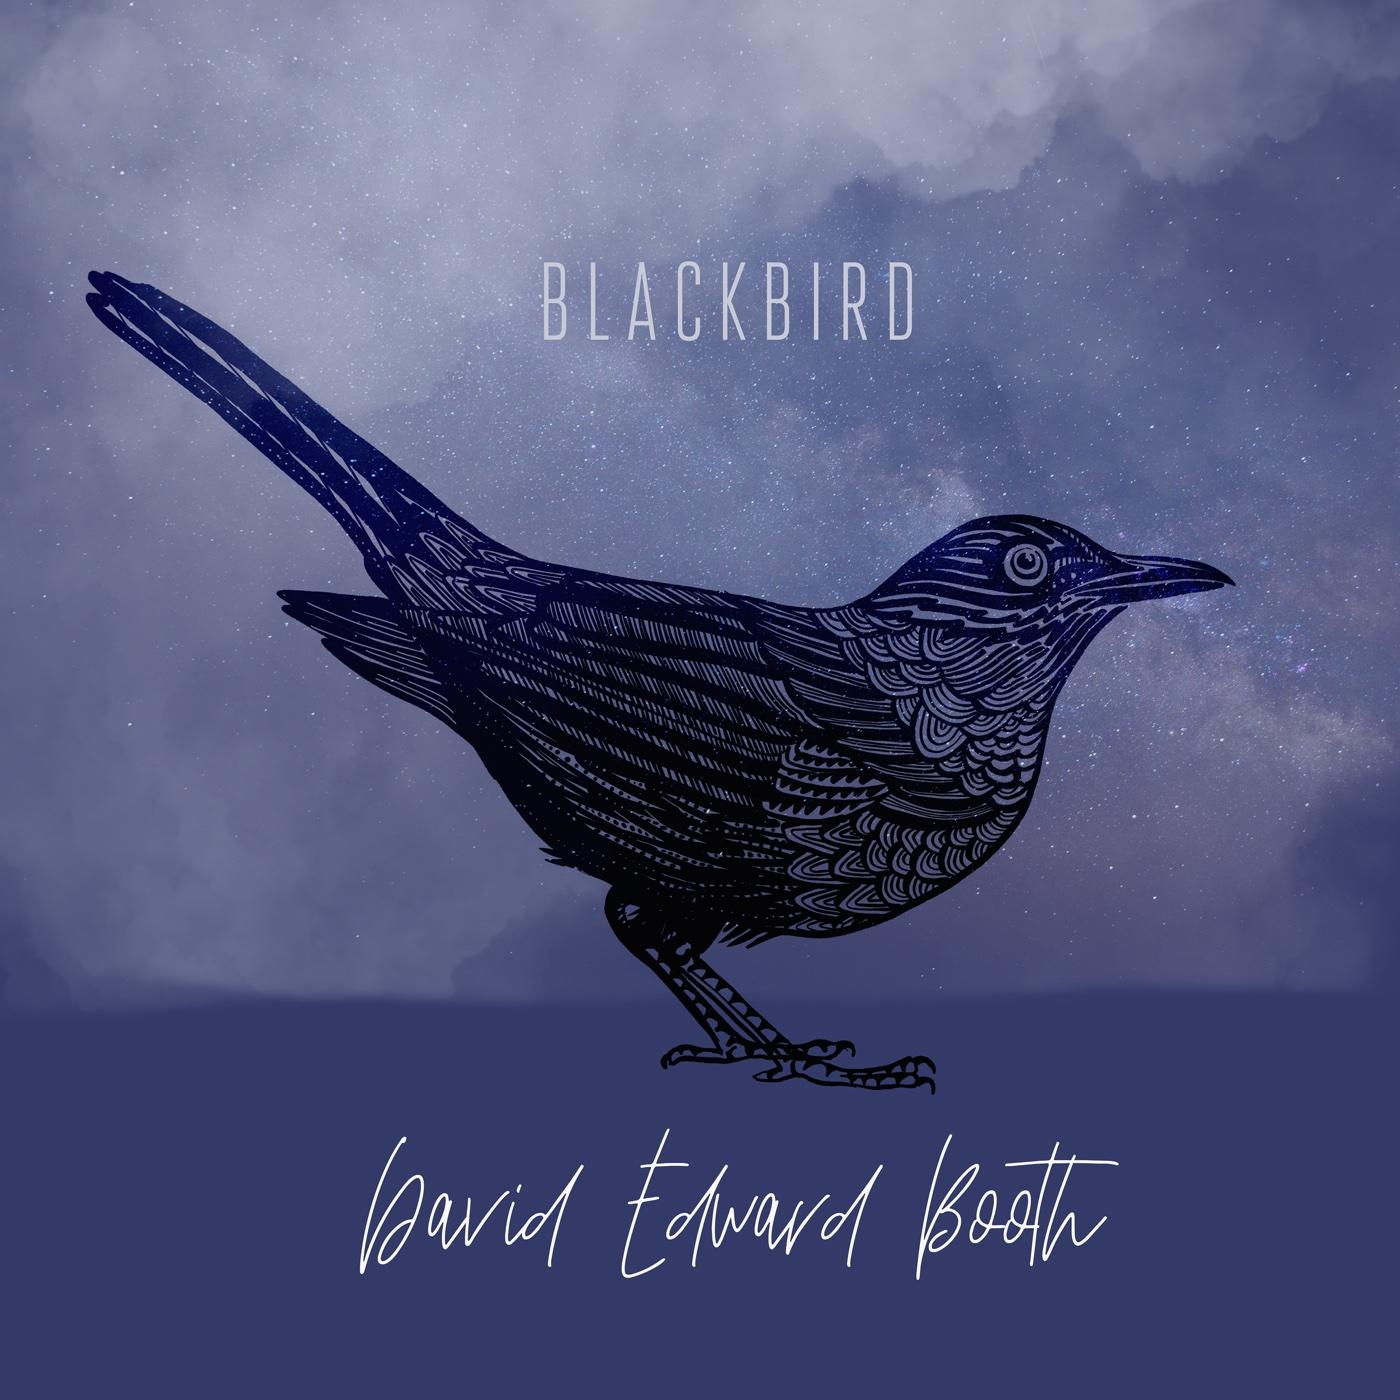 blackbird artwork for the song Blackbird by David Edward Booth